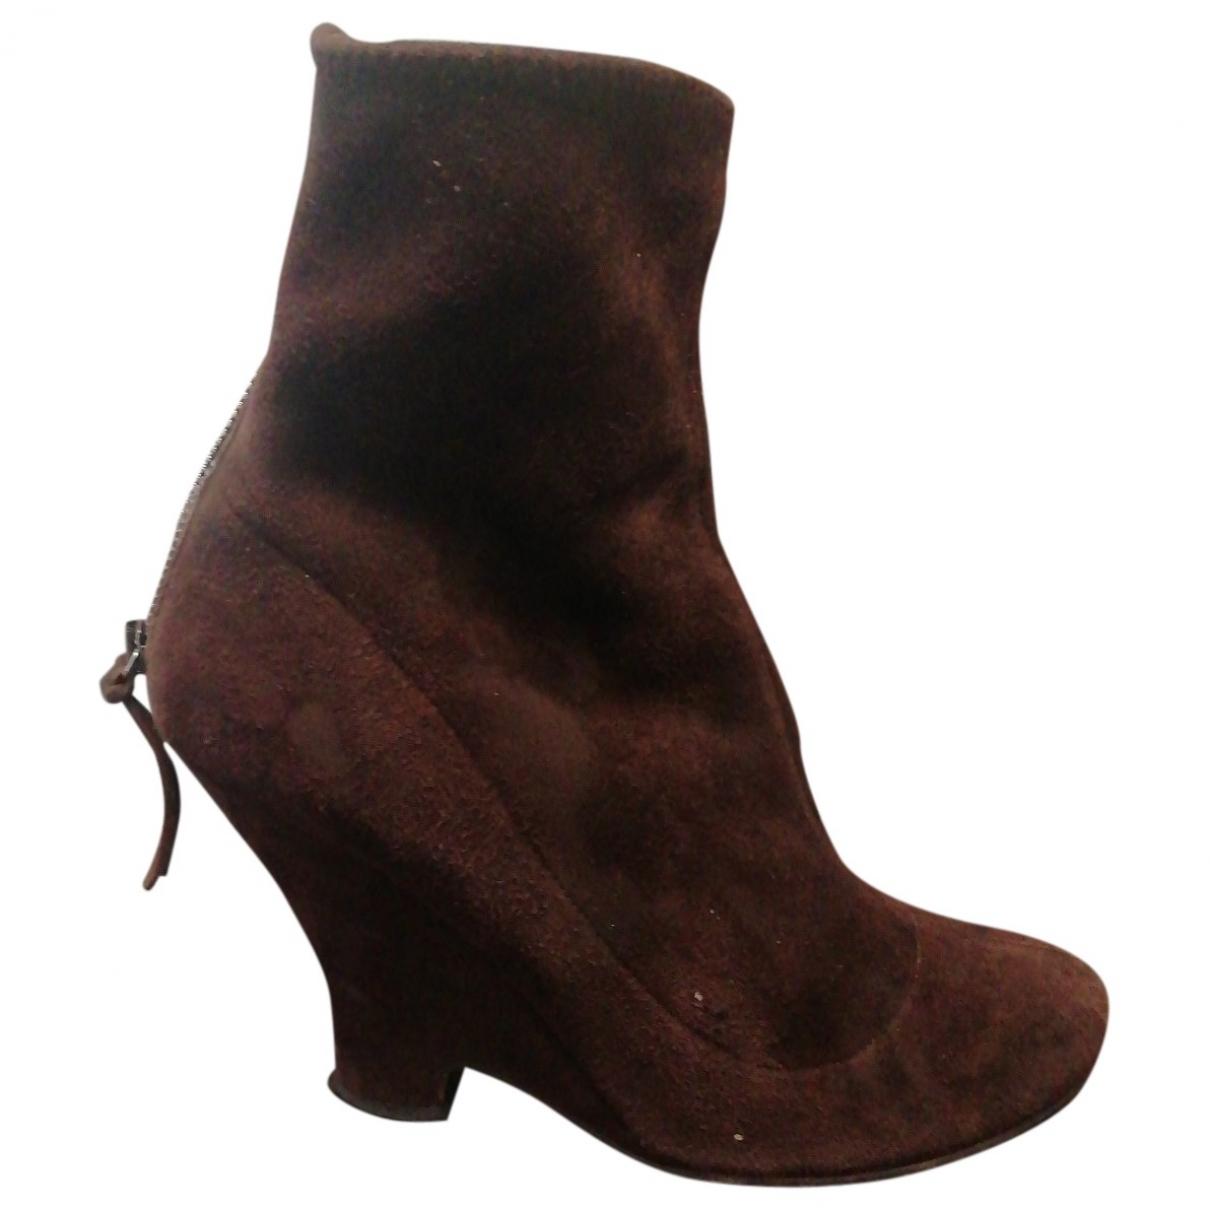 Miu Miu \N Brown Suede Ankle boots for Women 38.5 EU